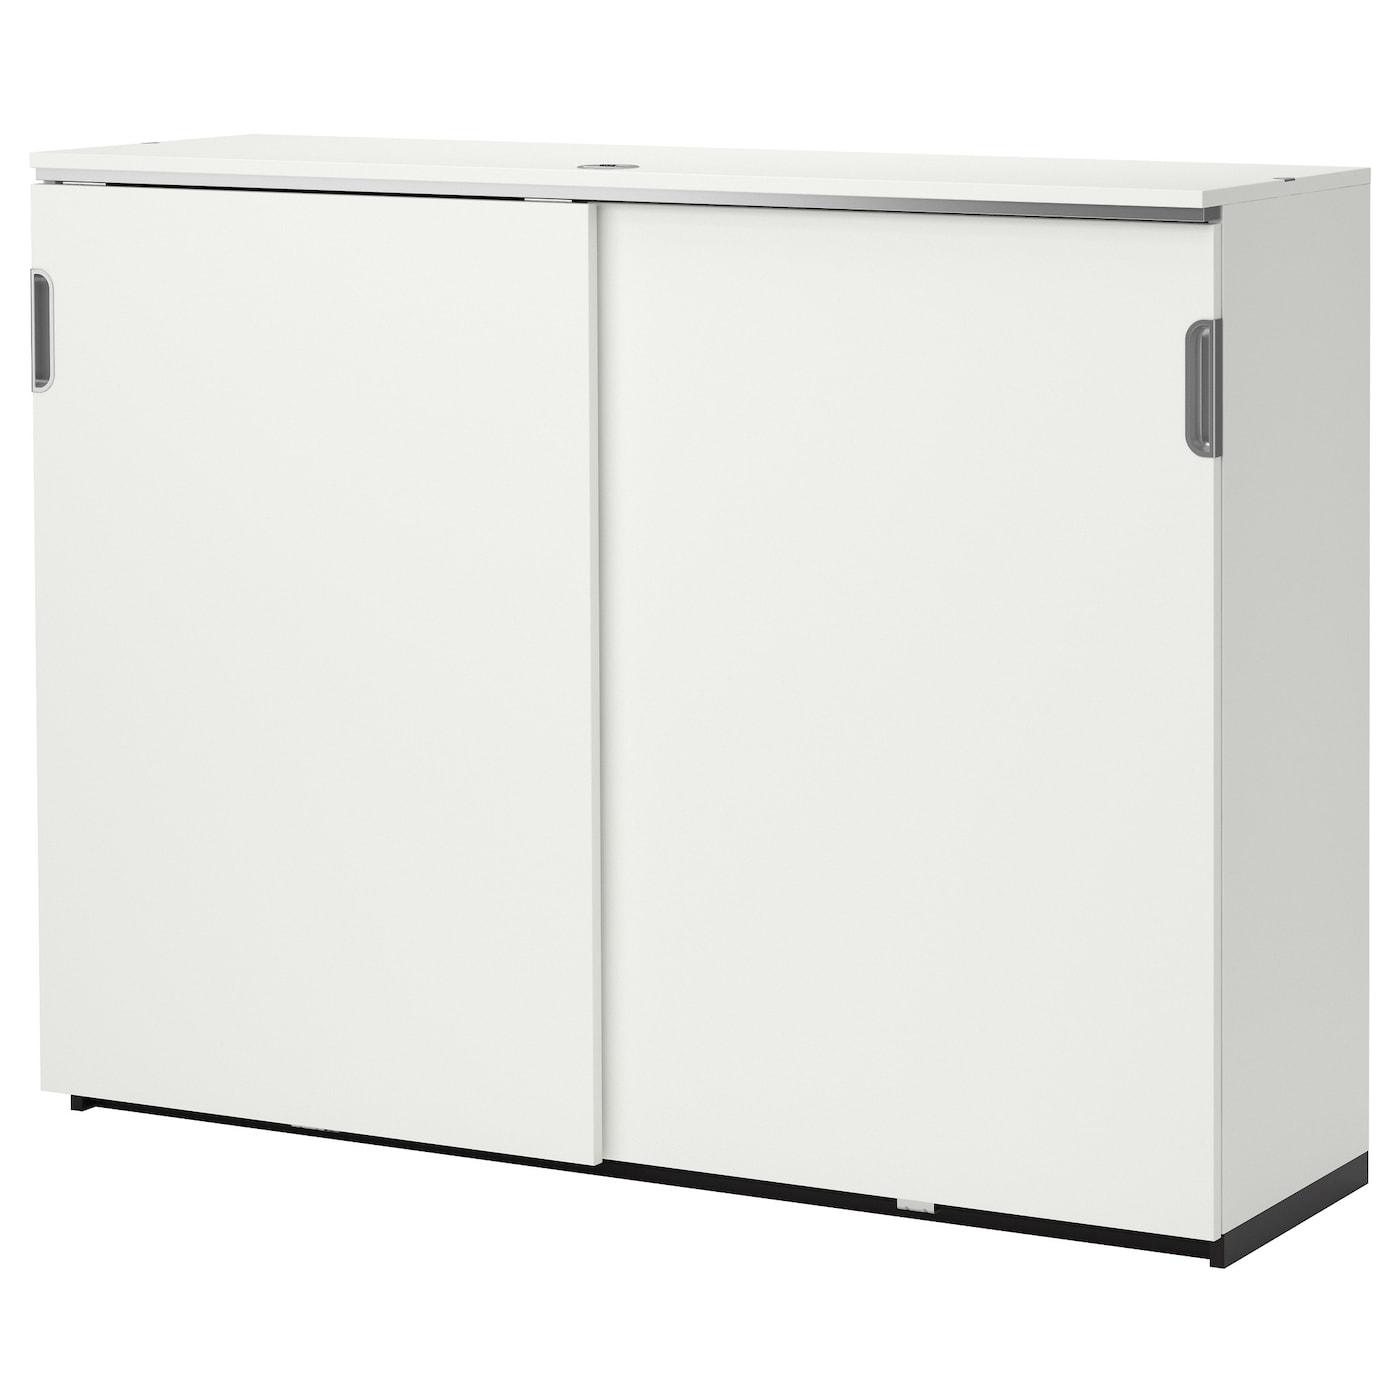 galant cabinet with sliding doors white 160 x 120 cm ikea. Black Bedroom Furniture Sets. Home Design Ideas